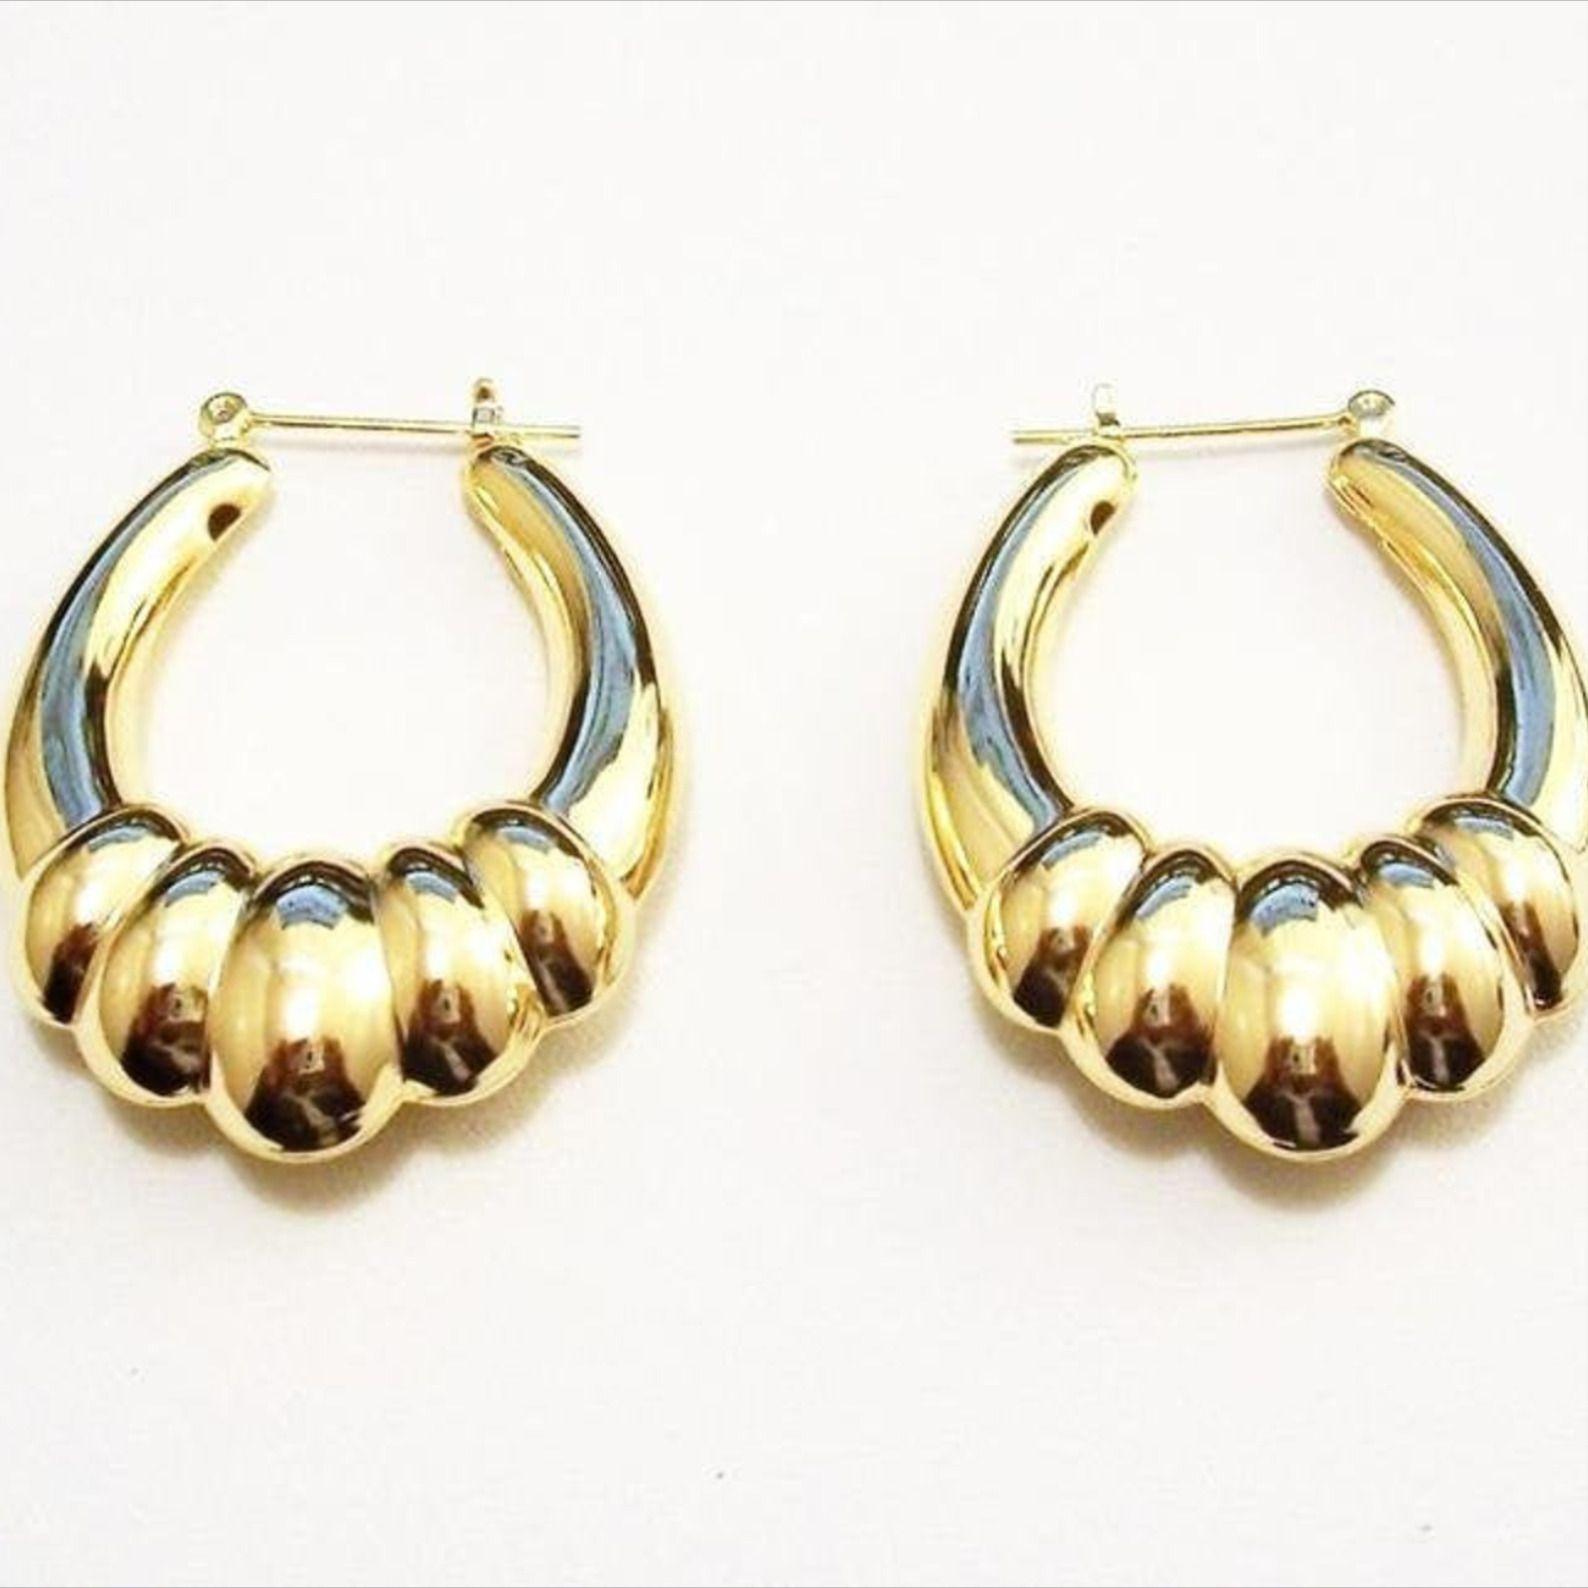 Monet ribbed shrimp style hoop clip on earrings in gold tone metal